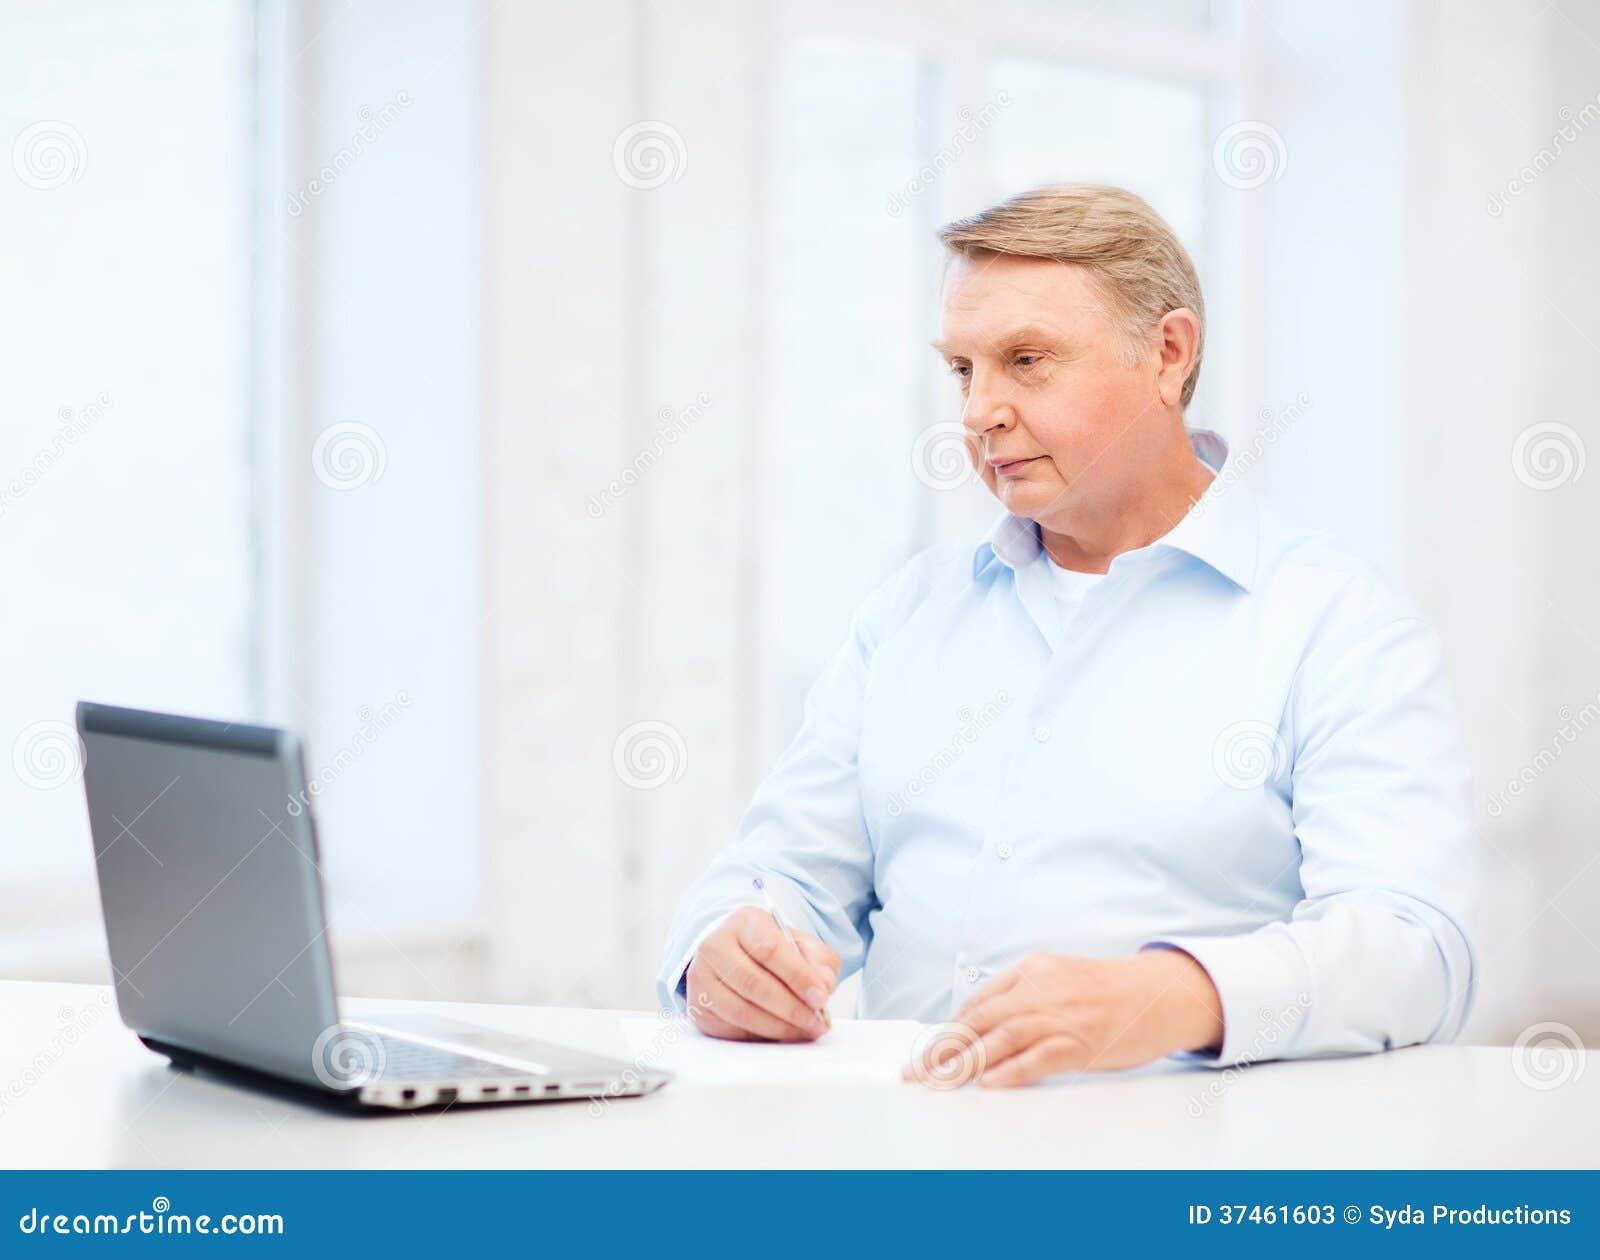 old man filling a form at home stock photos image 37461603. Black Bedroom Furniture Sets. Home Design Ideas